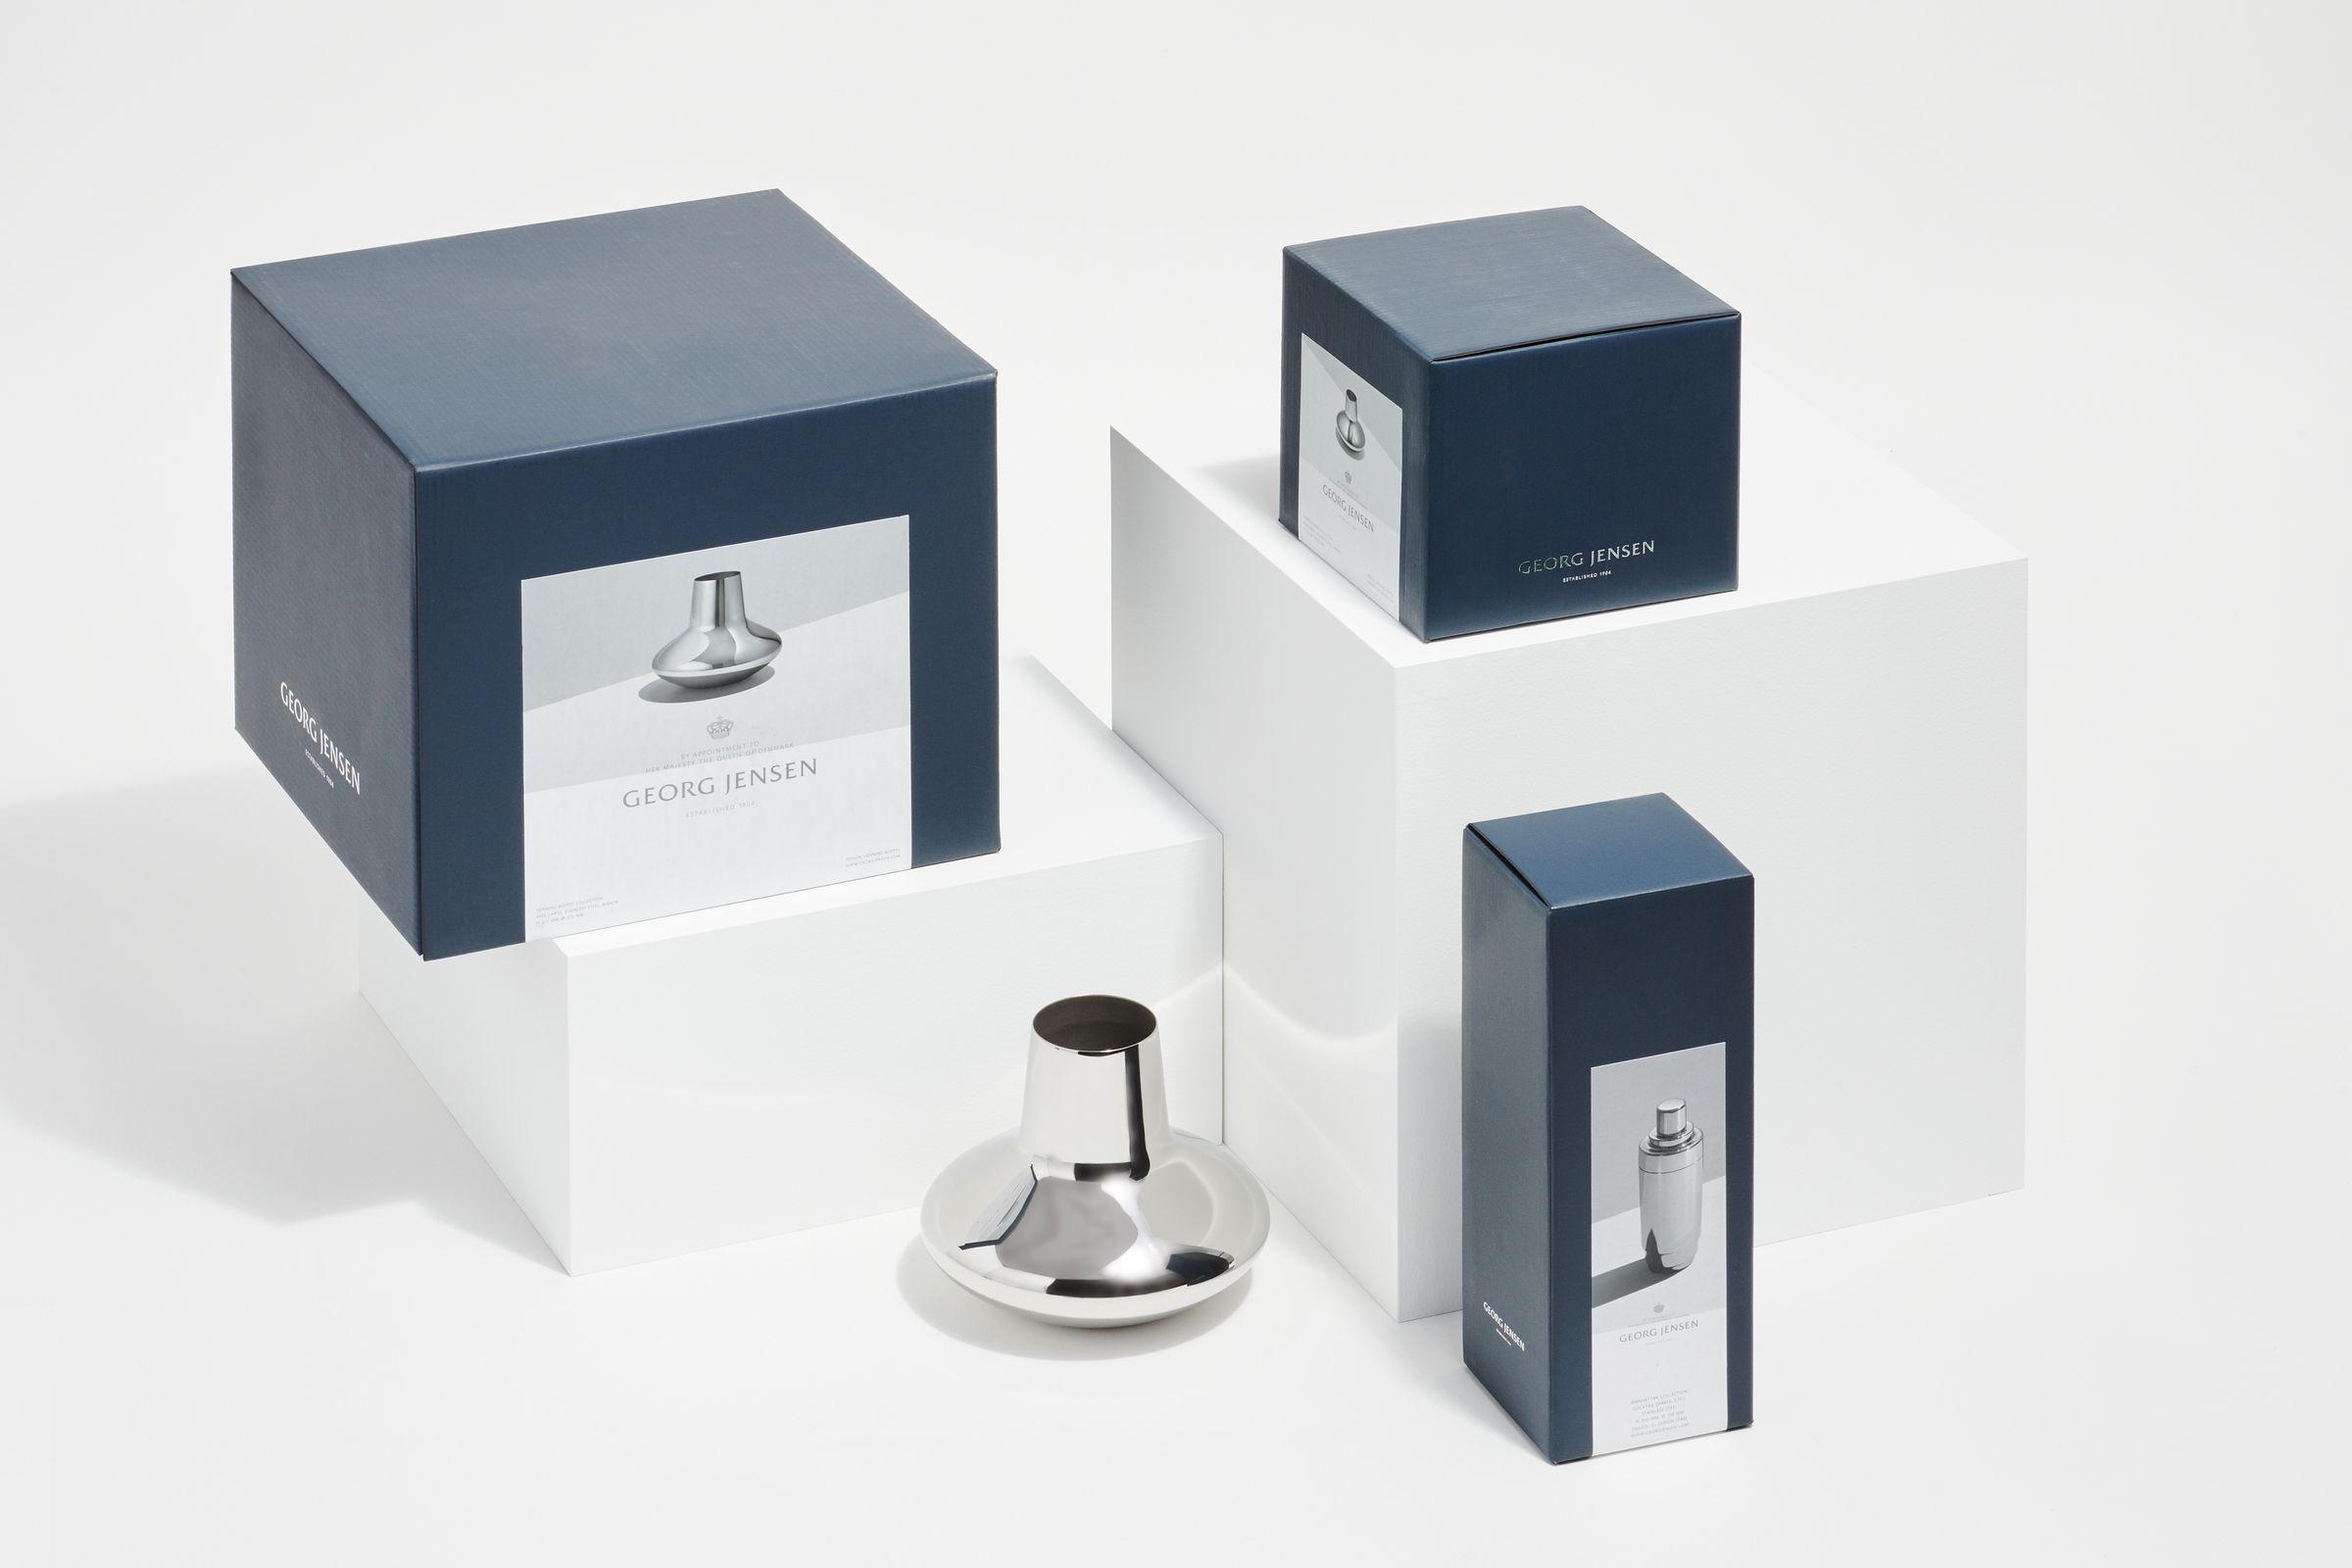 Georg Jensen packaging design